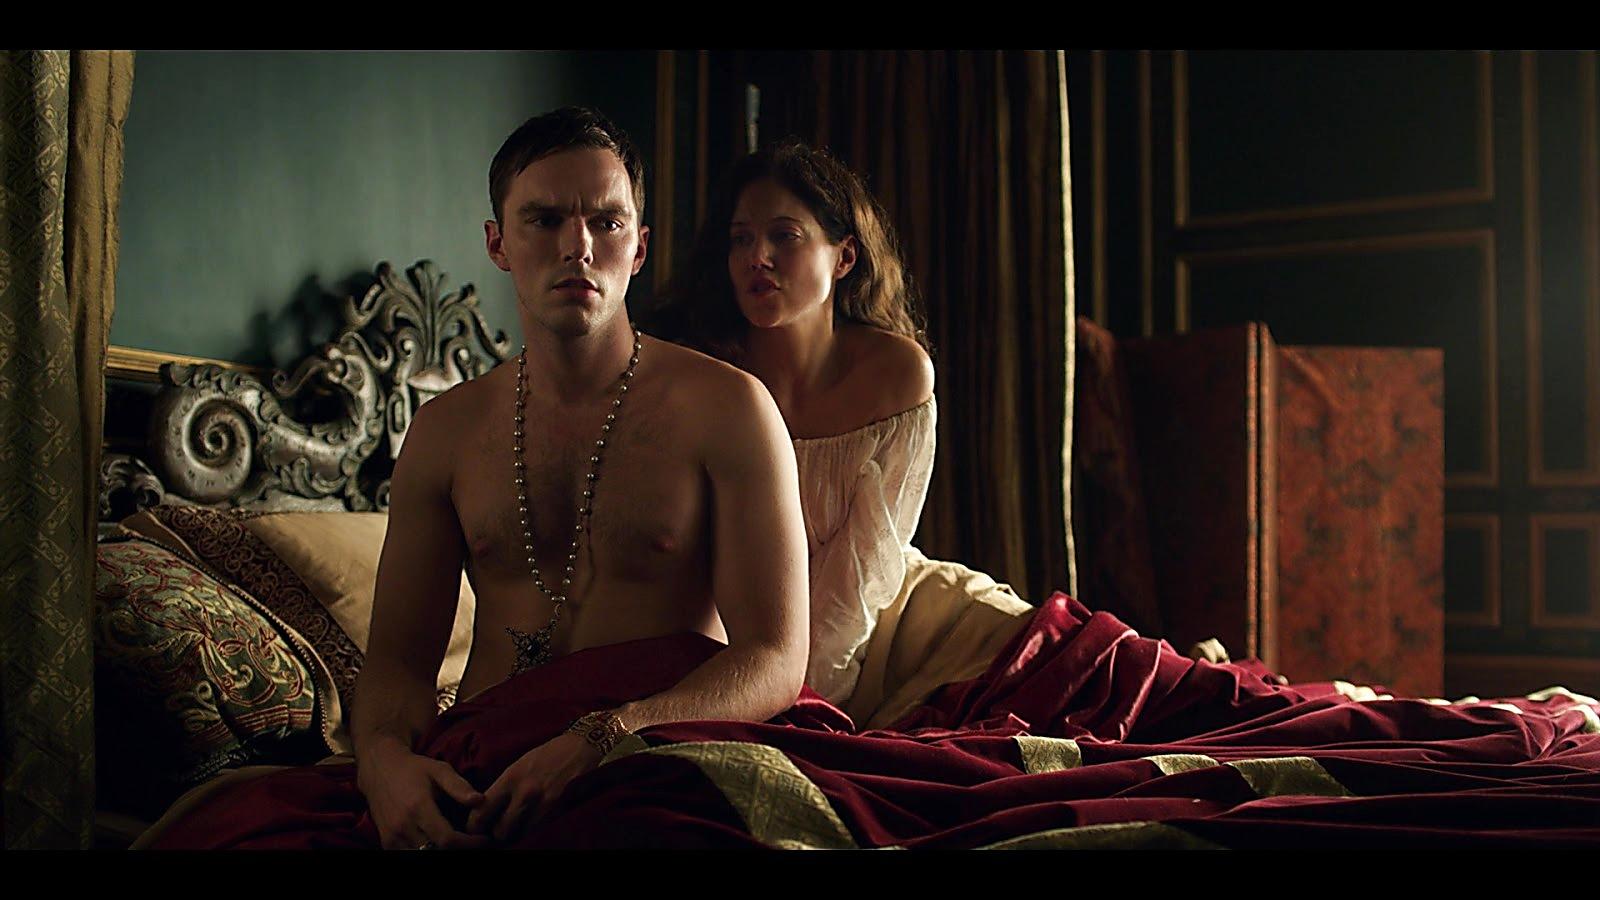 Nicholas Hoult sexy shirtless scene June 25, 2020, 12pm